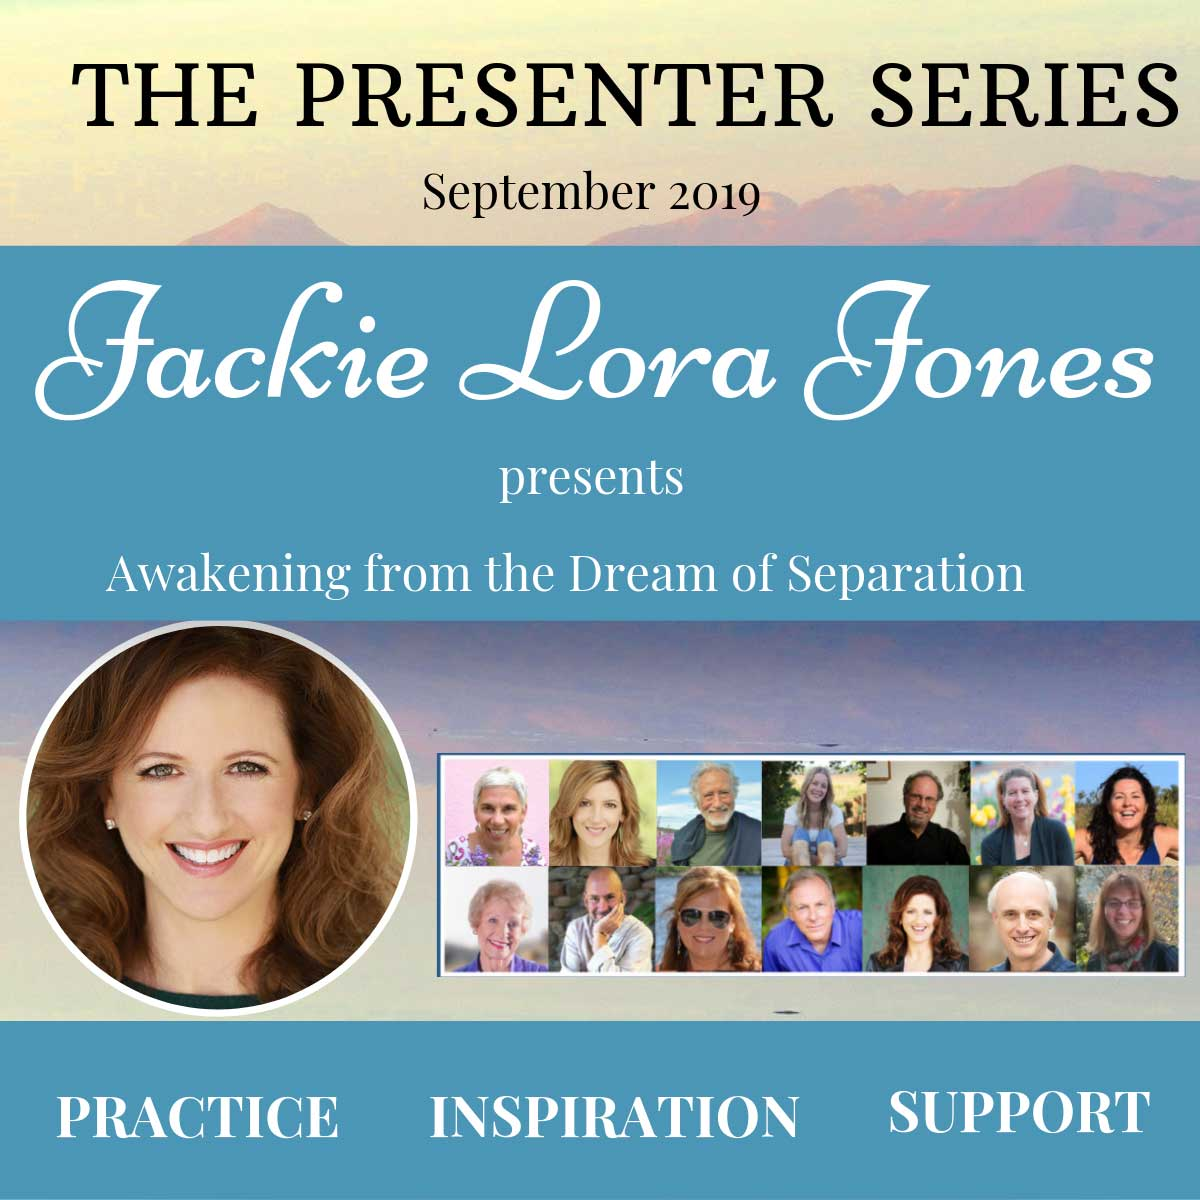 Jackie Lora Jones TOG Promo Sept 2019